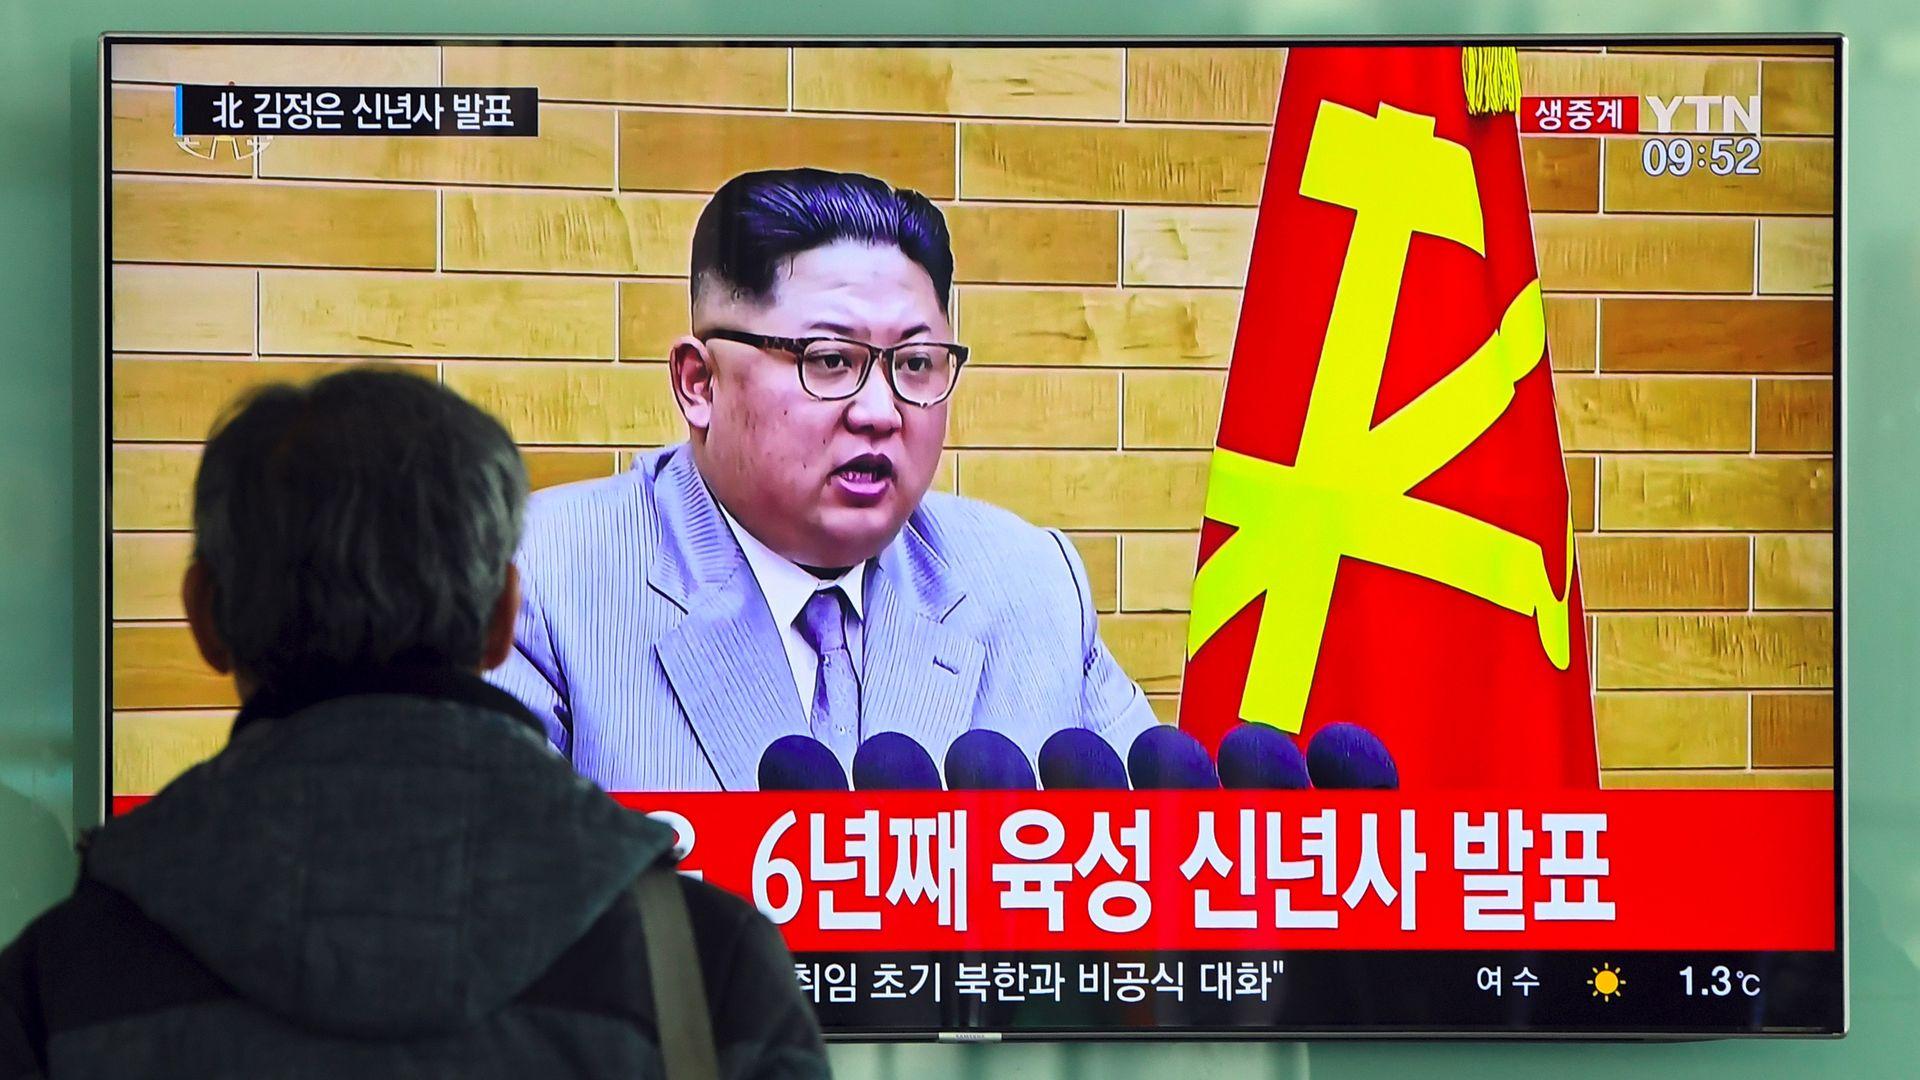 Kim Jong-un press conference.